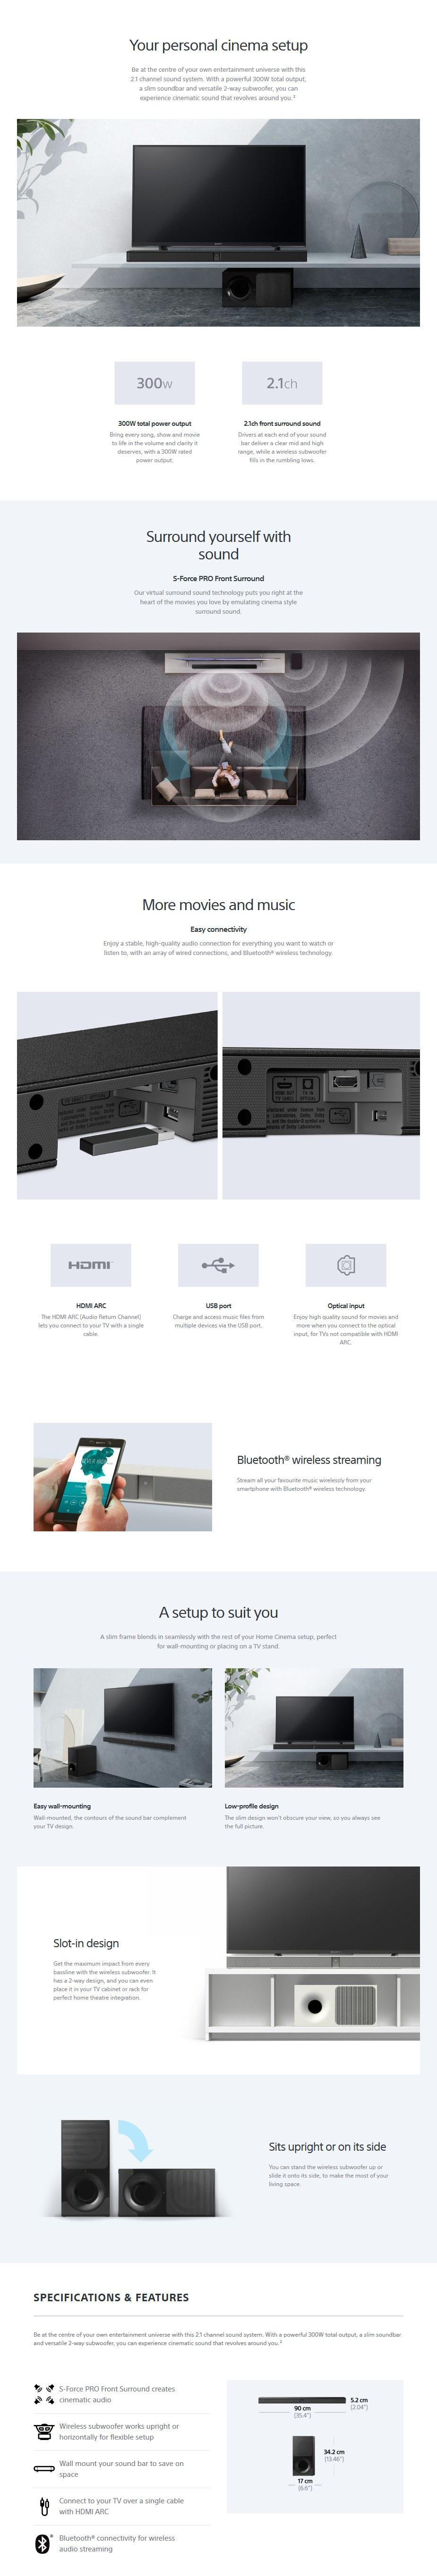 Sony HT-CT290 2.1 Bluetooth Soundbar System - Desktop Overview 1